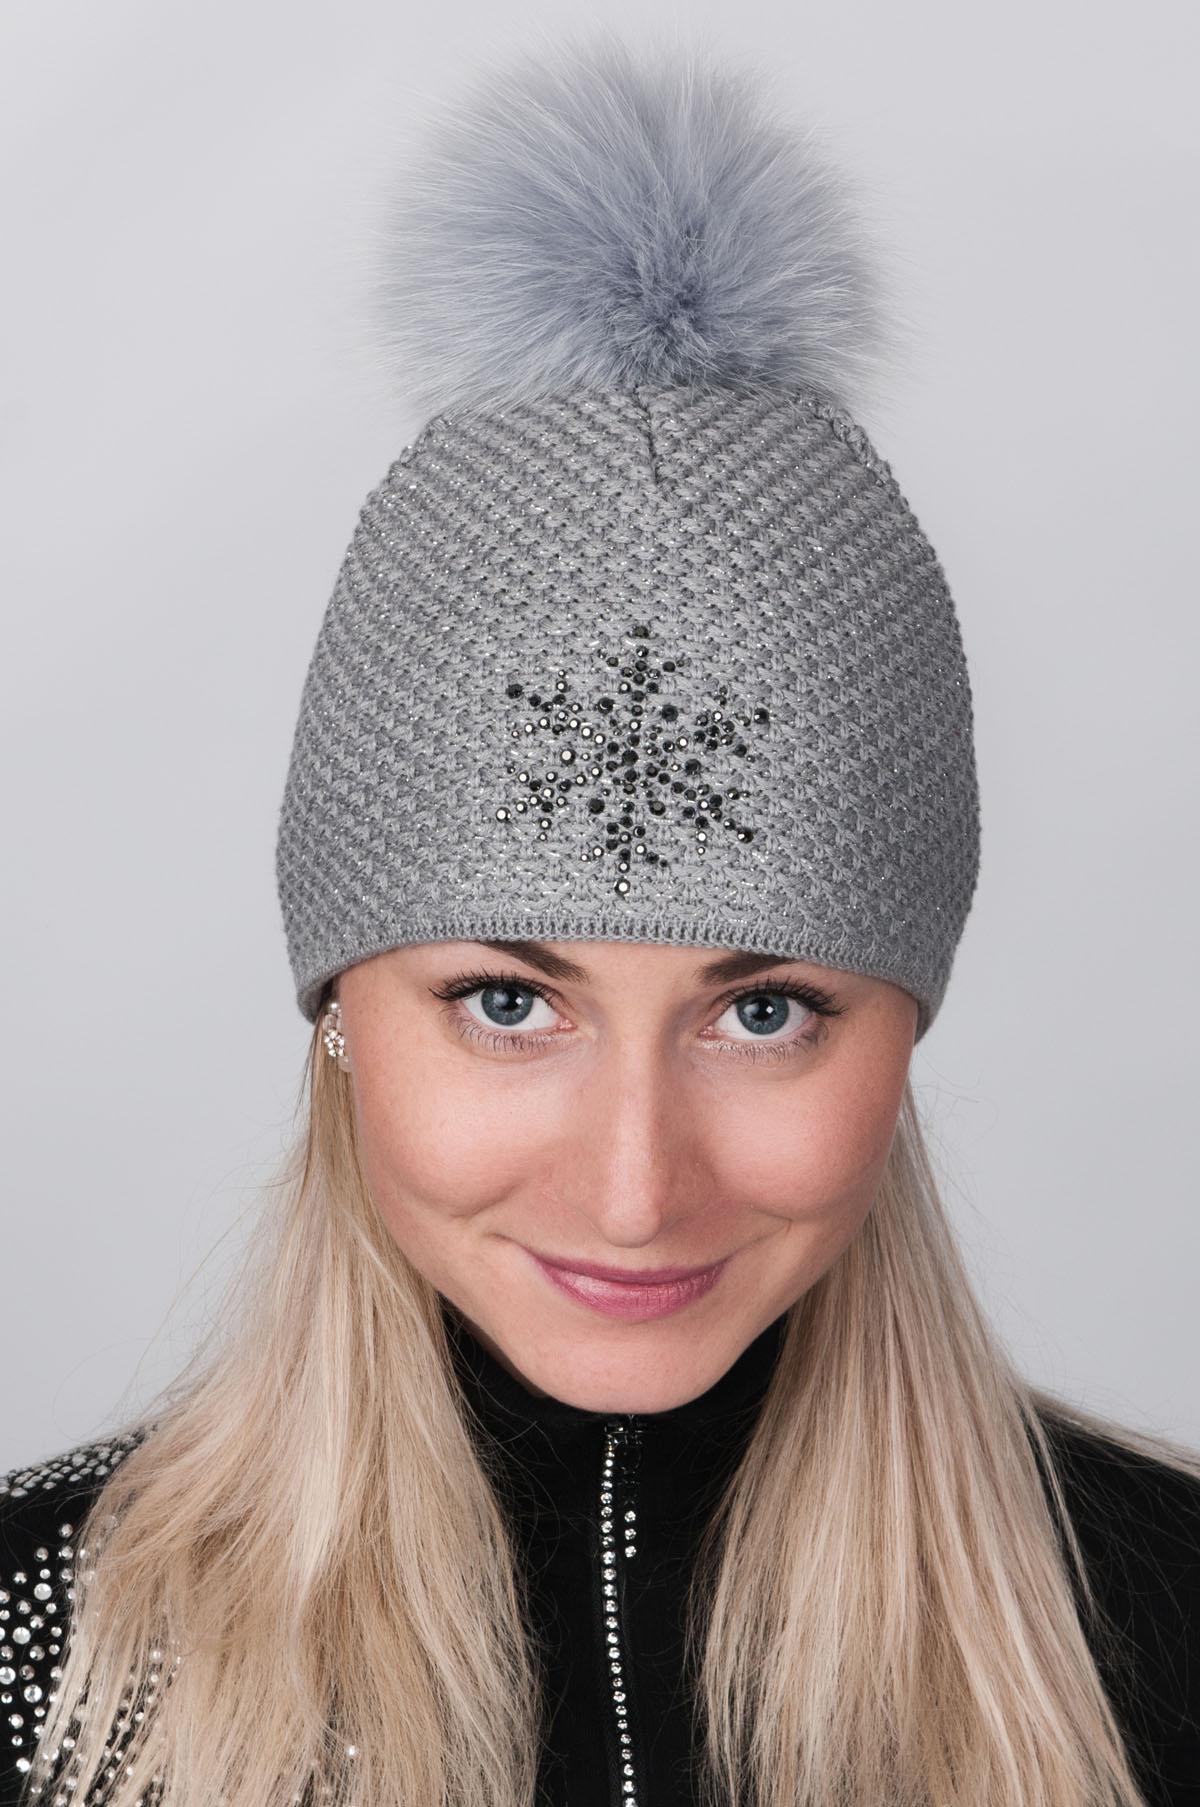 ec1ebcd0d Dámska čiapka R-Jet Top Fashion exclusive šedá-strieborný lurex